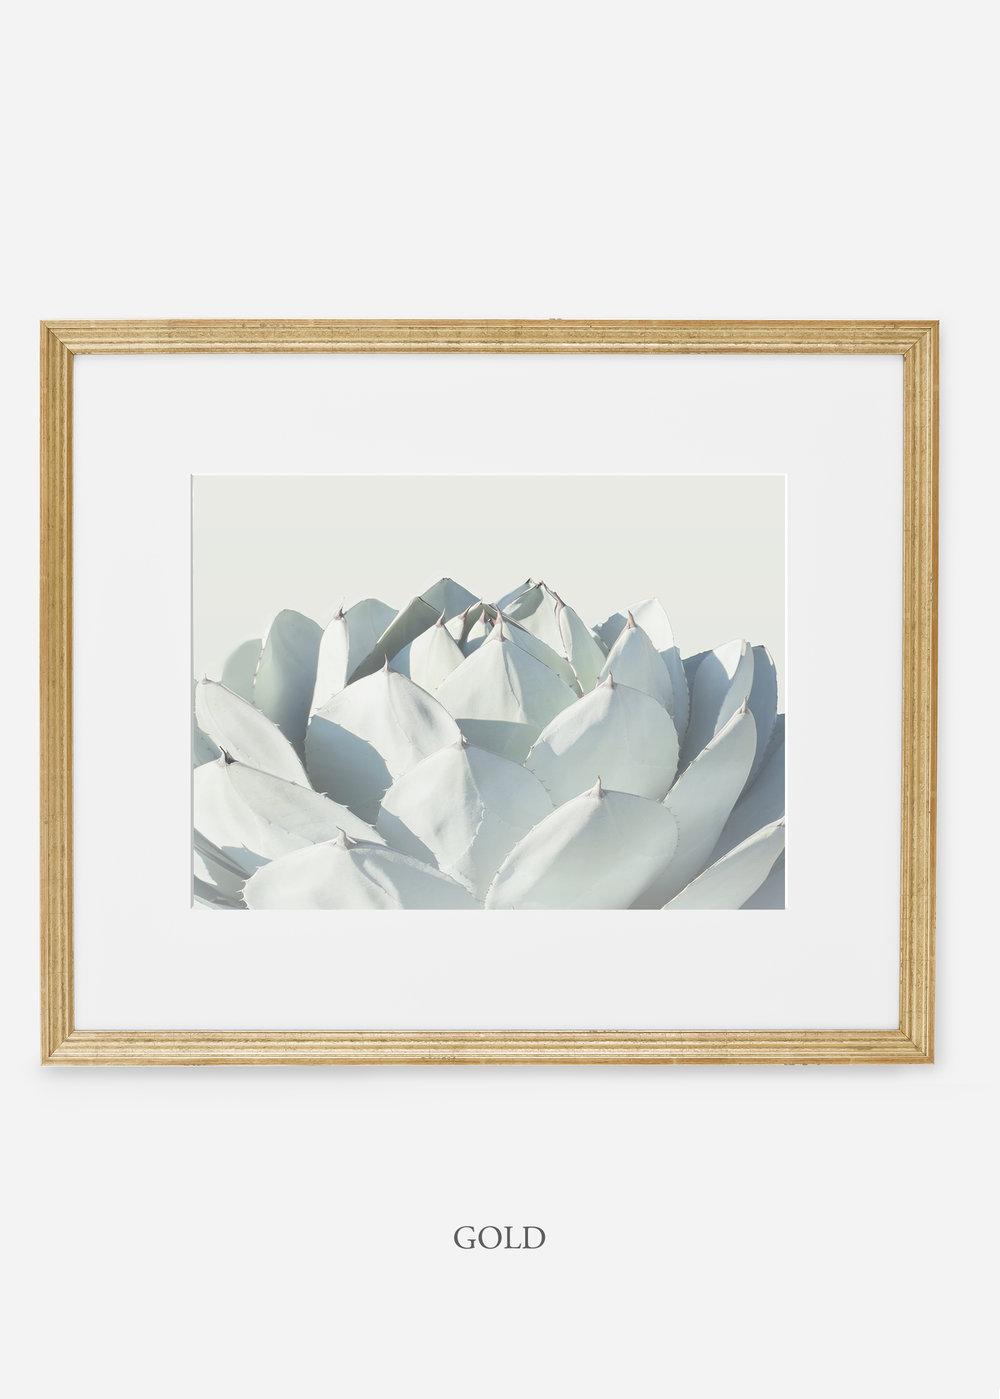 WilderCalifornia_goldframe_Cactus_Art_Photography_interiordesign_white_bohemian_neutral_photography_photo.jpg